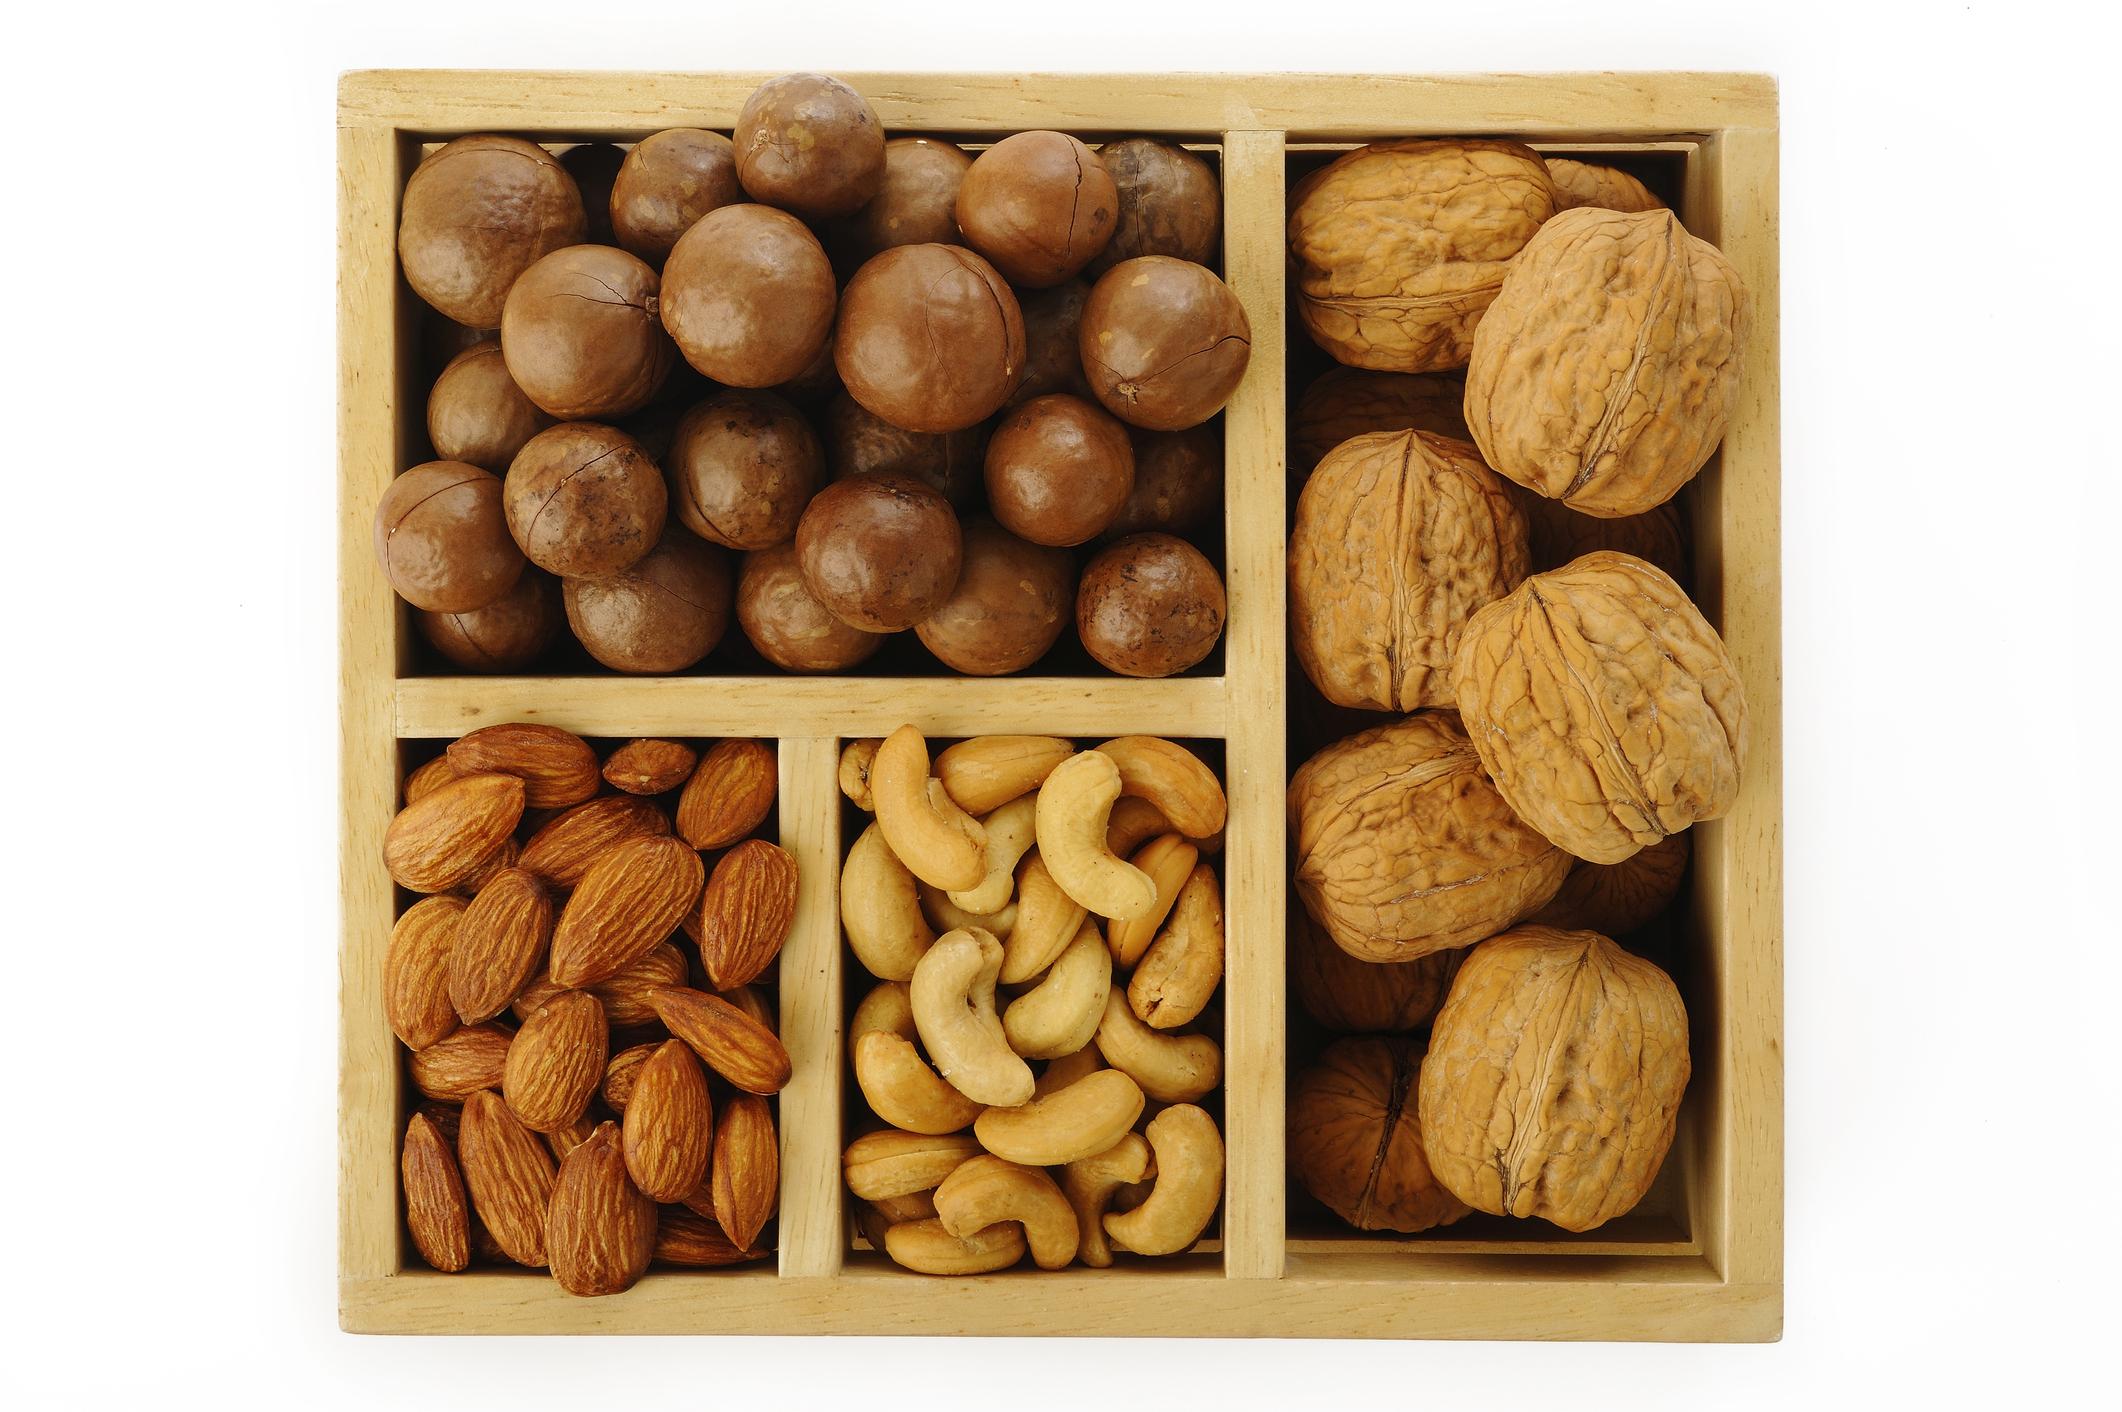 © Phloenphoto   Dreamstime.com - Assorted Nuts Photo